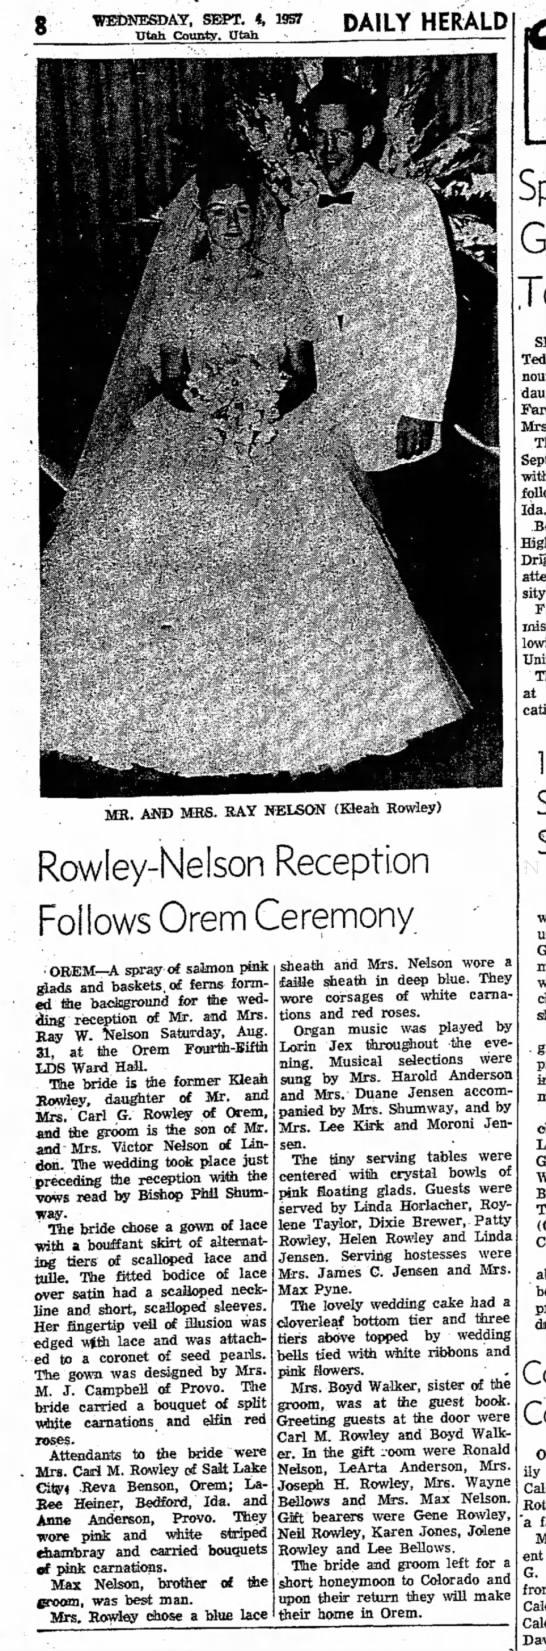 Ray/KleahNelson Wedding Announcement 4/Sep1957 - 8 WEDNESDAY, SEPT. 4, 1957 Utah County. Utah...